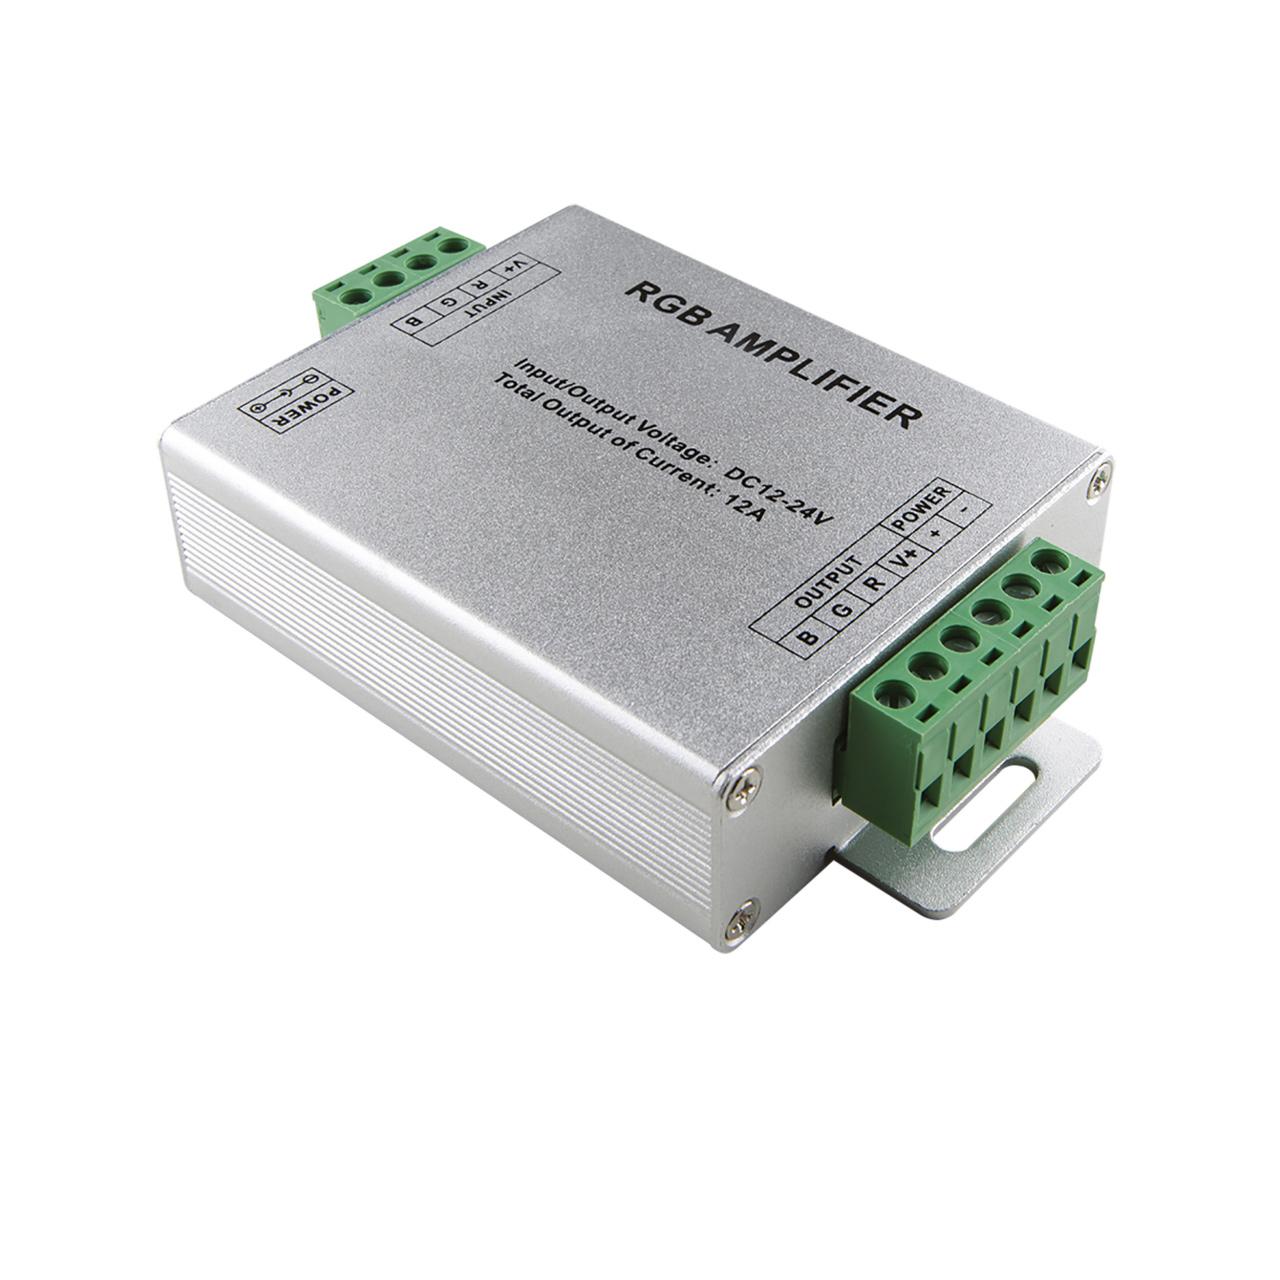 Усилитель сигнала LED RGB 12V/24V max 4A*3CH Lightstar 410704